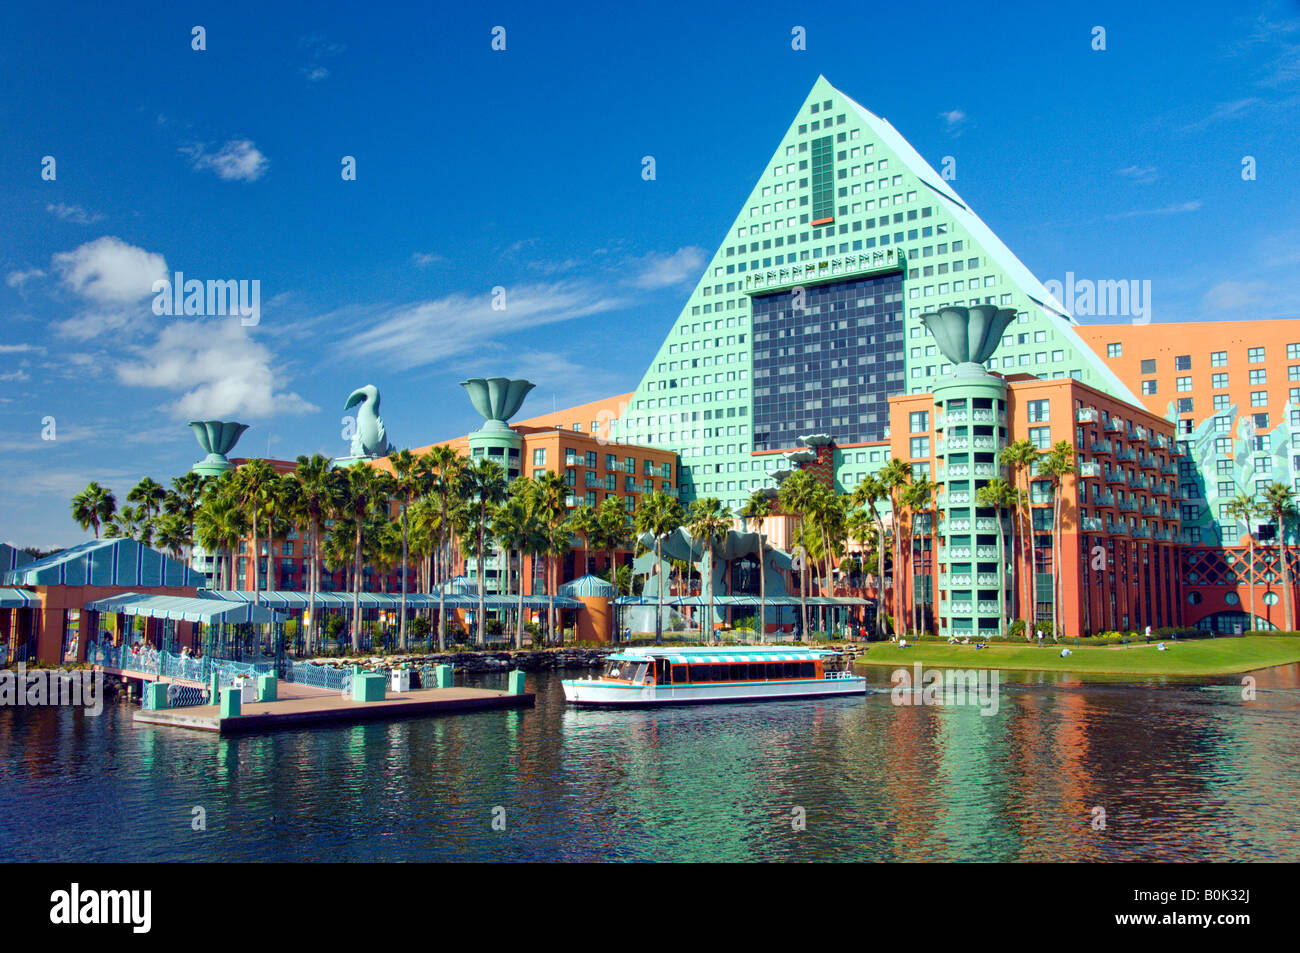 Hotel Rooms in Lake Buena Vista  Walt Disney World Dolphin